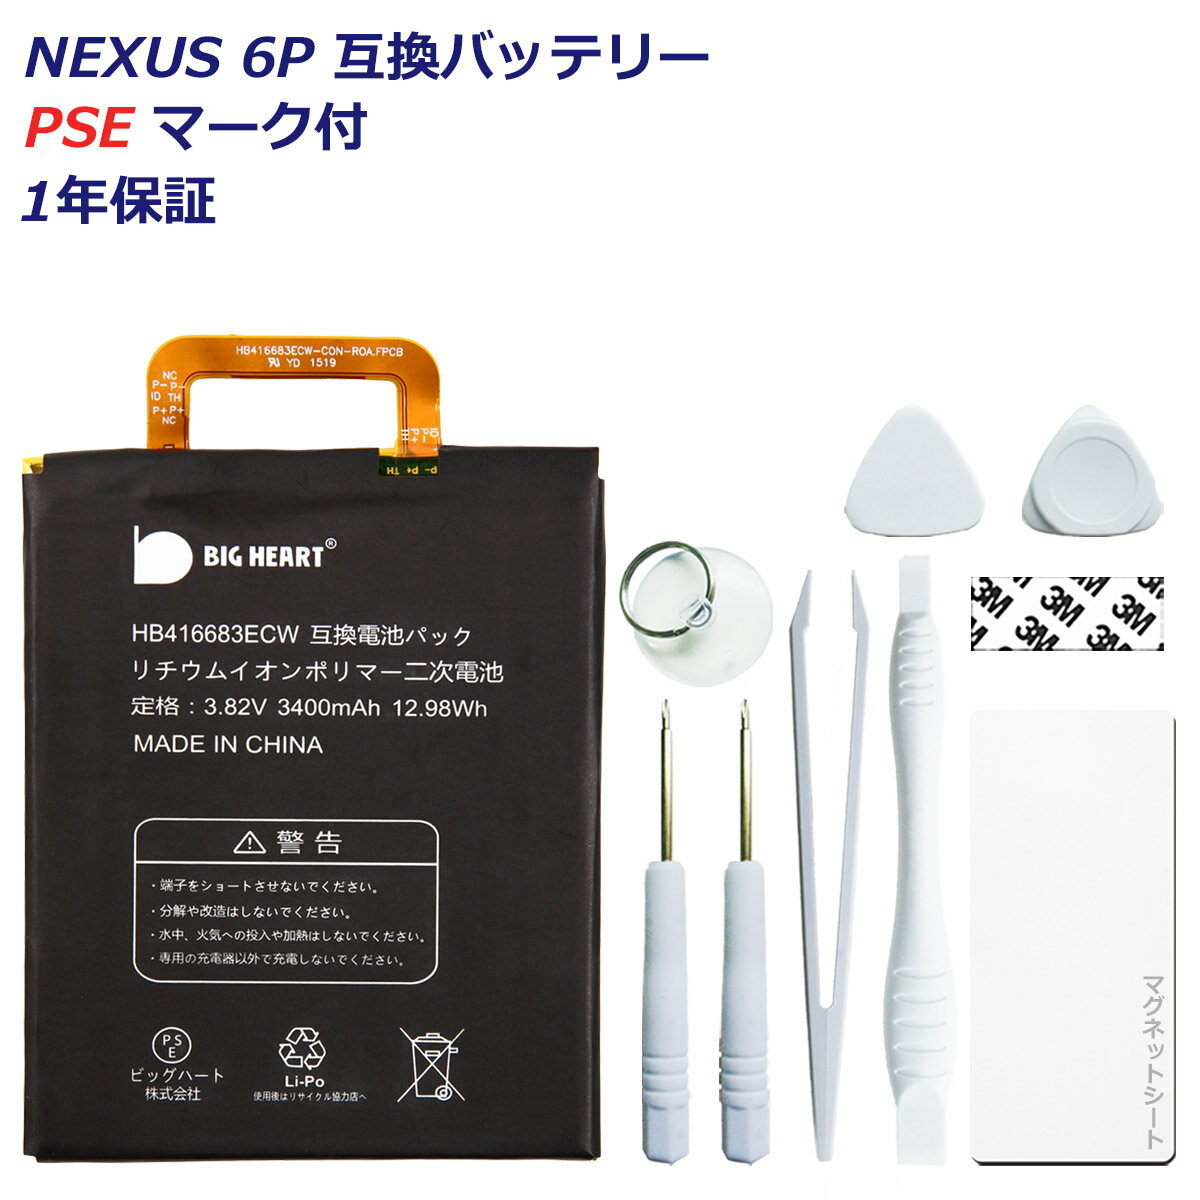 (YP)B-607【GOOGLE 互換品】【送料無料】 NEXUS 6P 高品質 専用互換バッテリー 交換用 取り付け工具セット付 バッテリー 電池パック google nexus6P (ビッグハート)P23Jan16